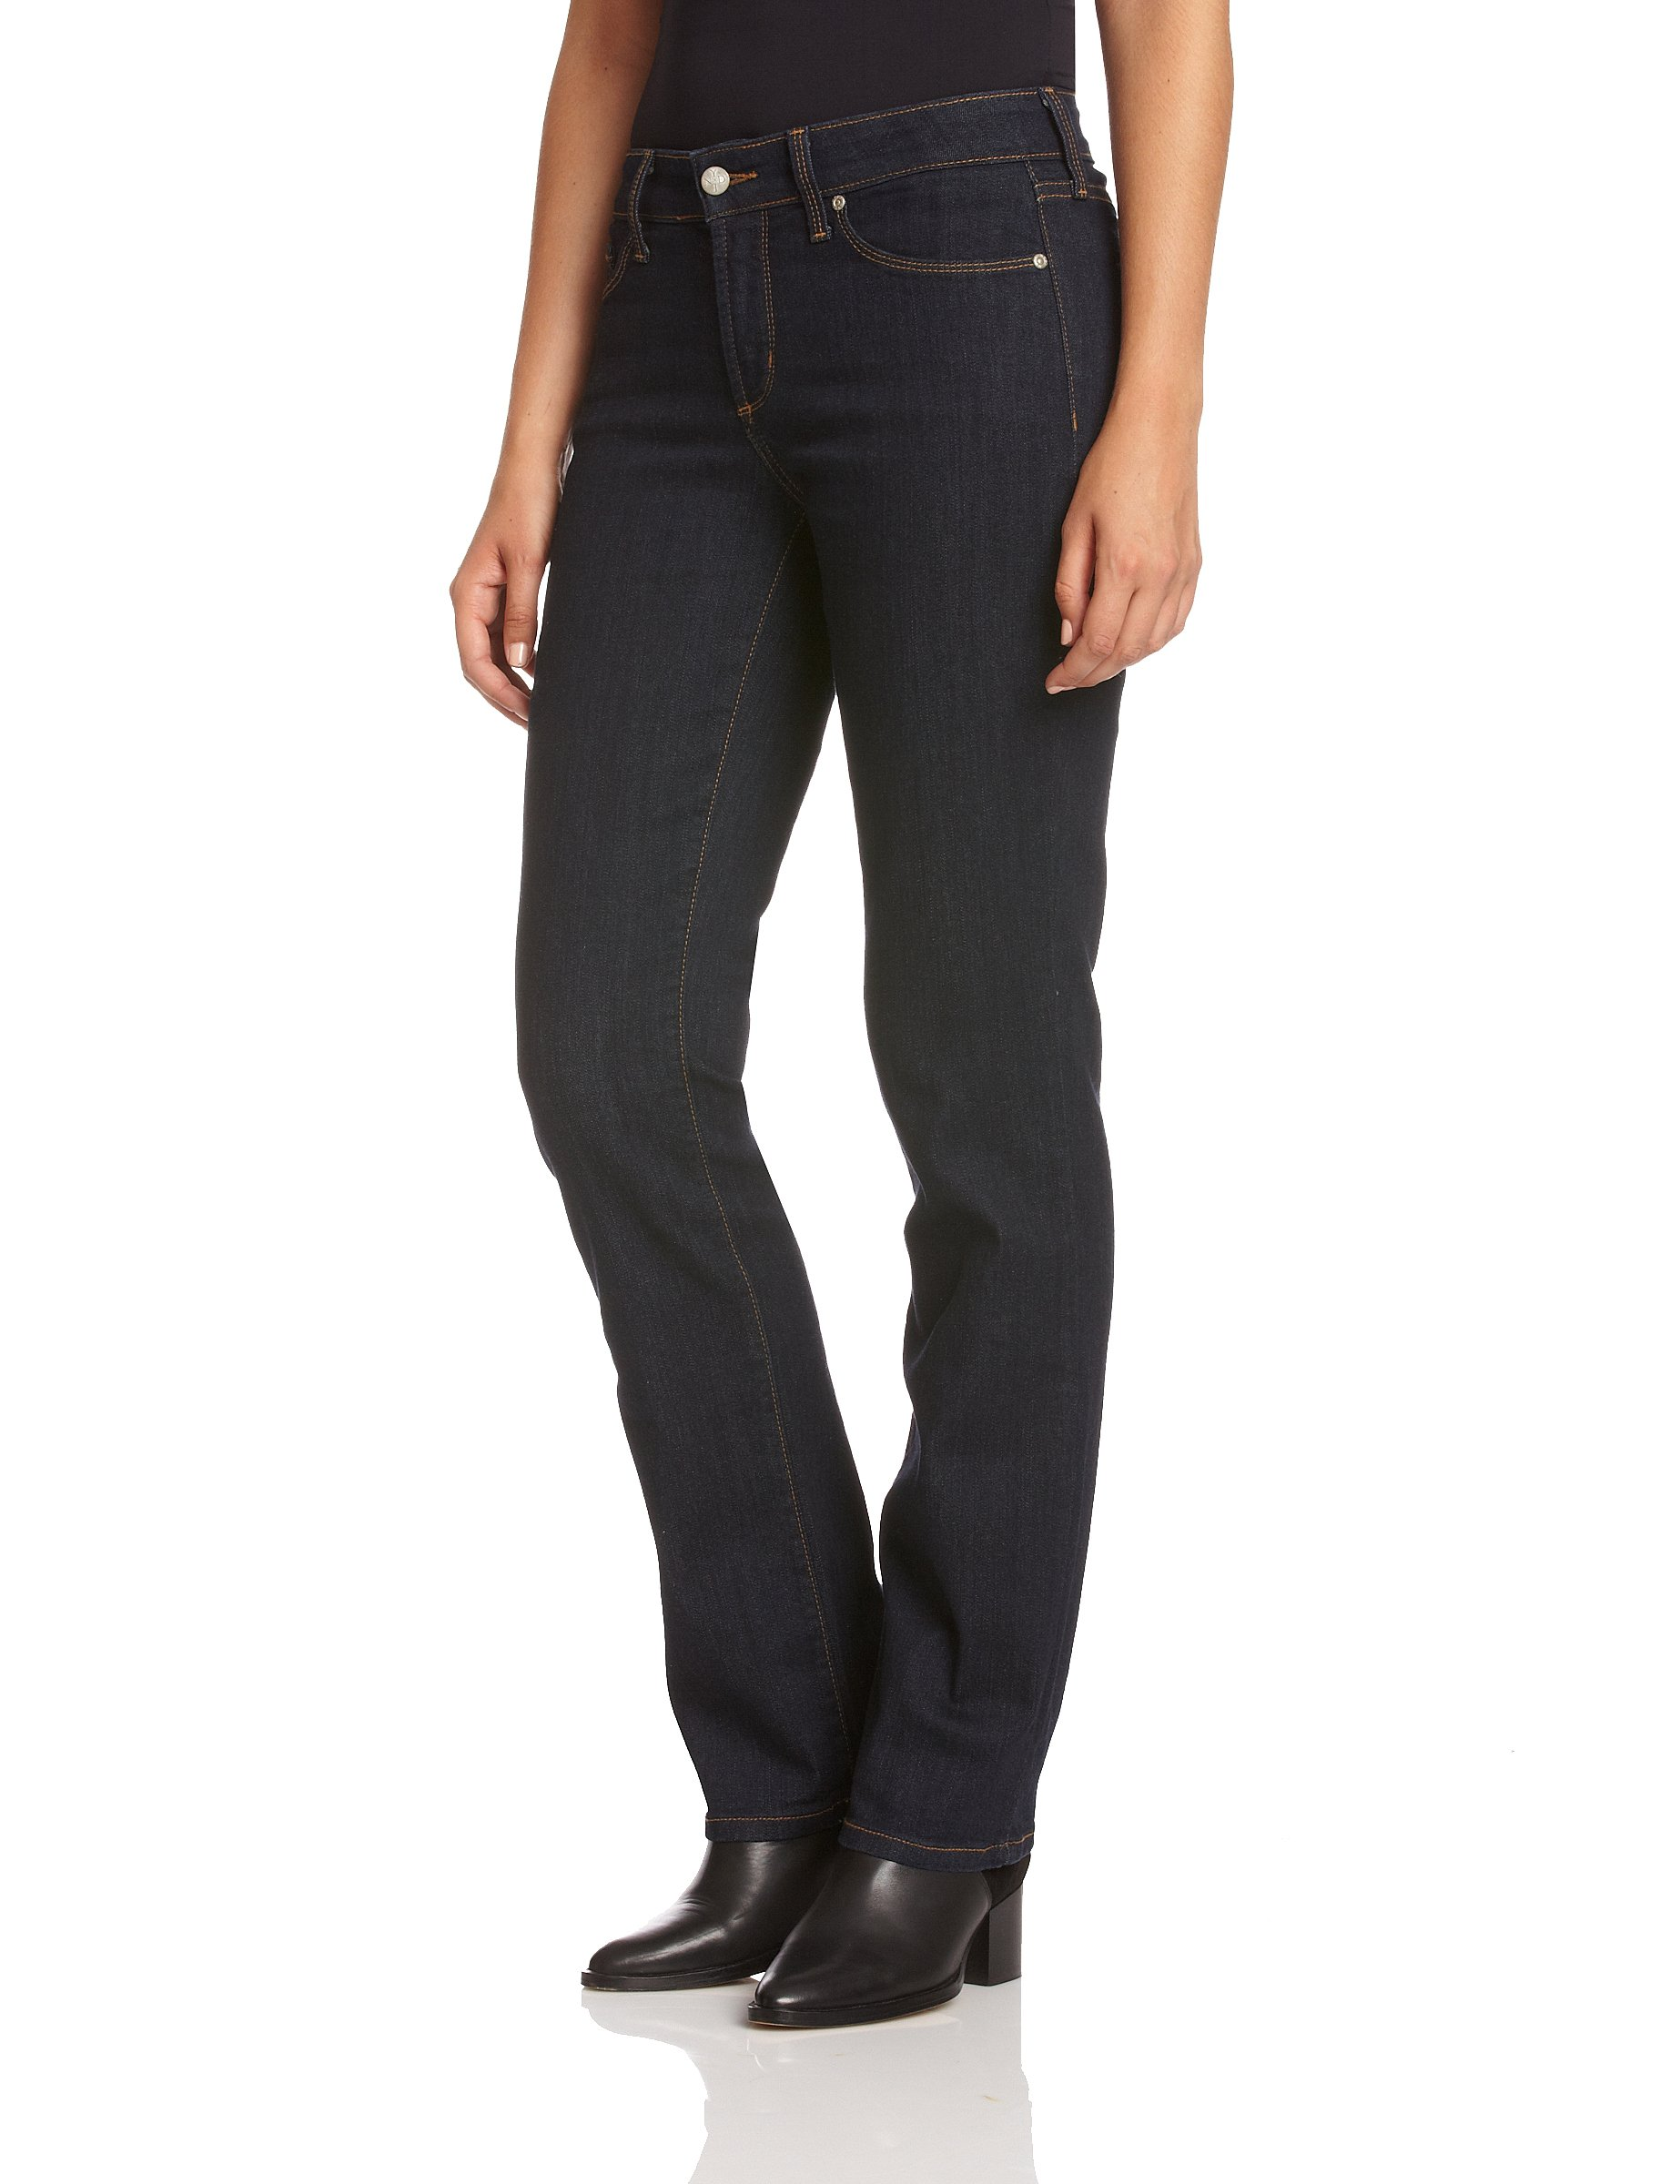 Jeans FemmeBleudark Droit DenimFr6taille Fabricant Nydj 6 JFK1lc